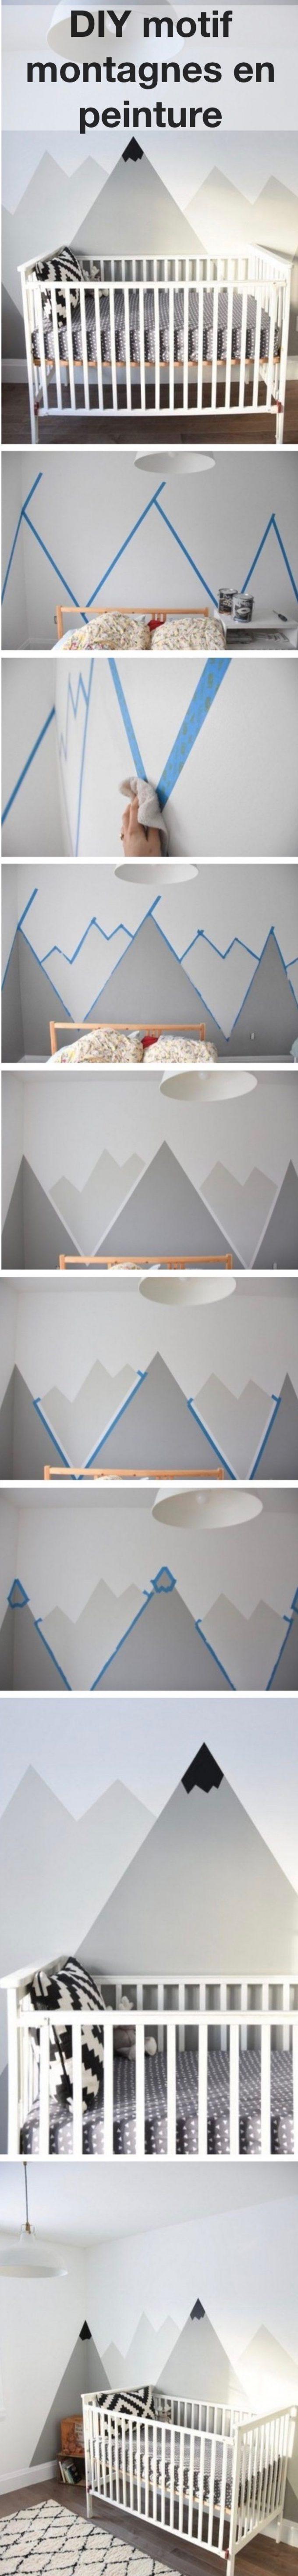 DIY peinture motif montagne tutoriel clemaroundthecorner